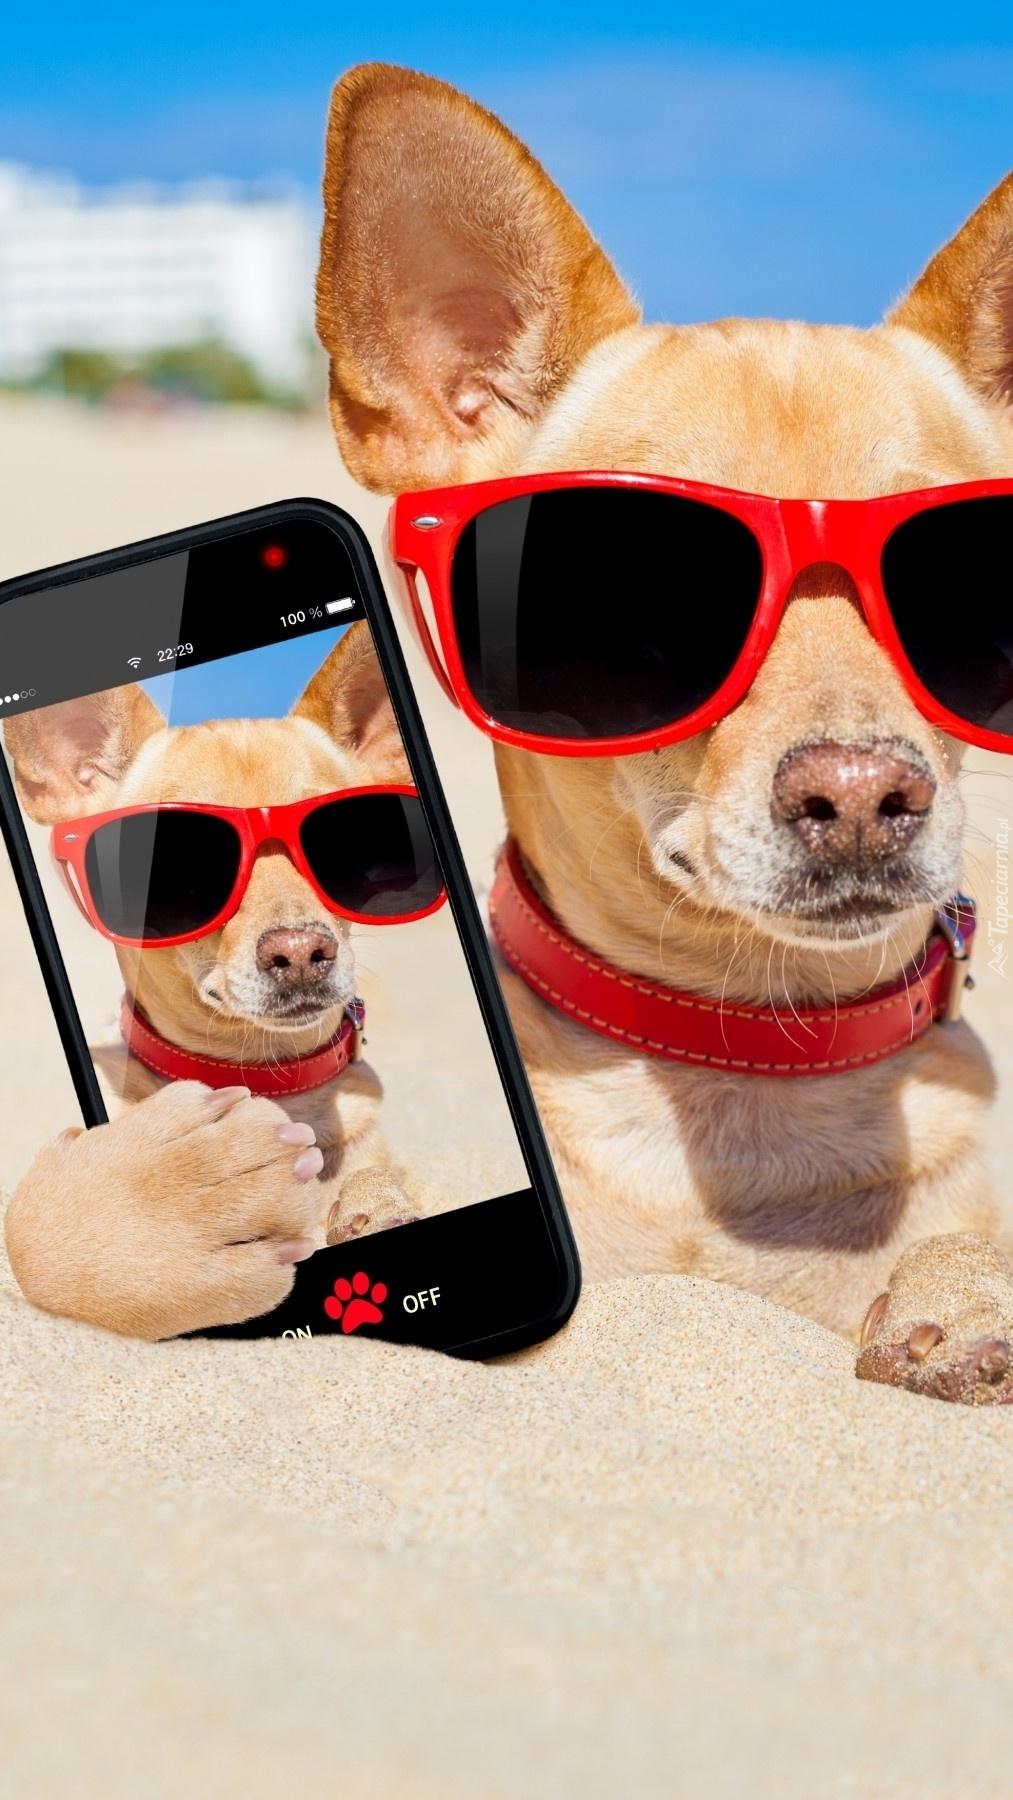 Pies i jego selfie